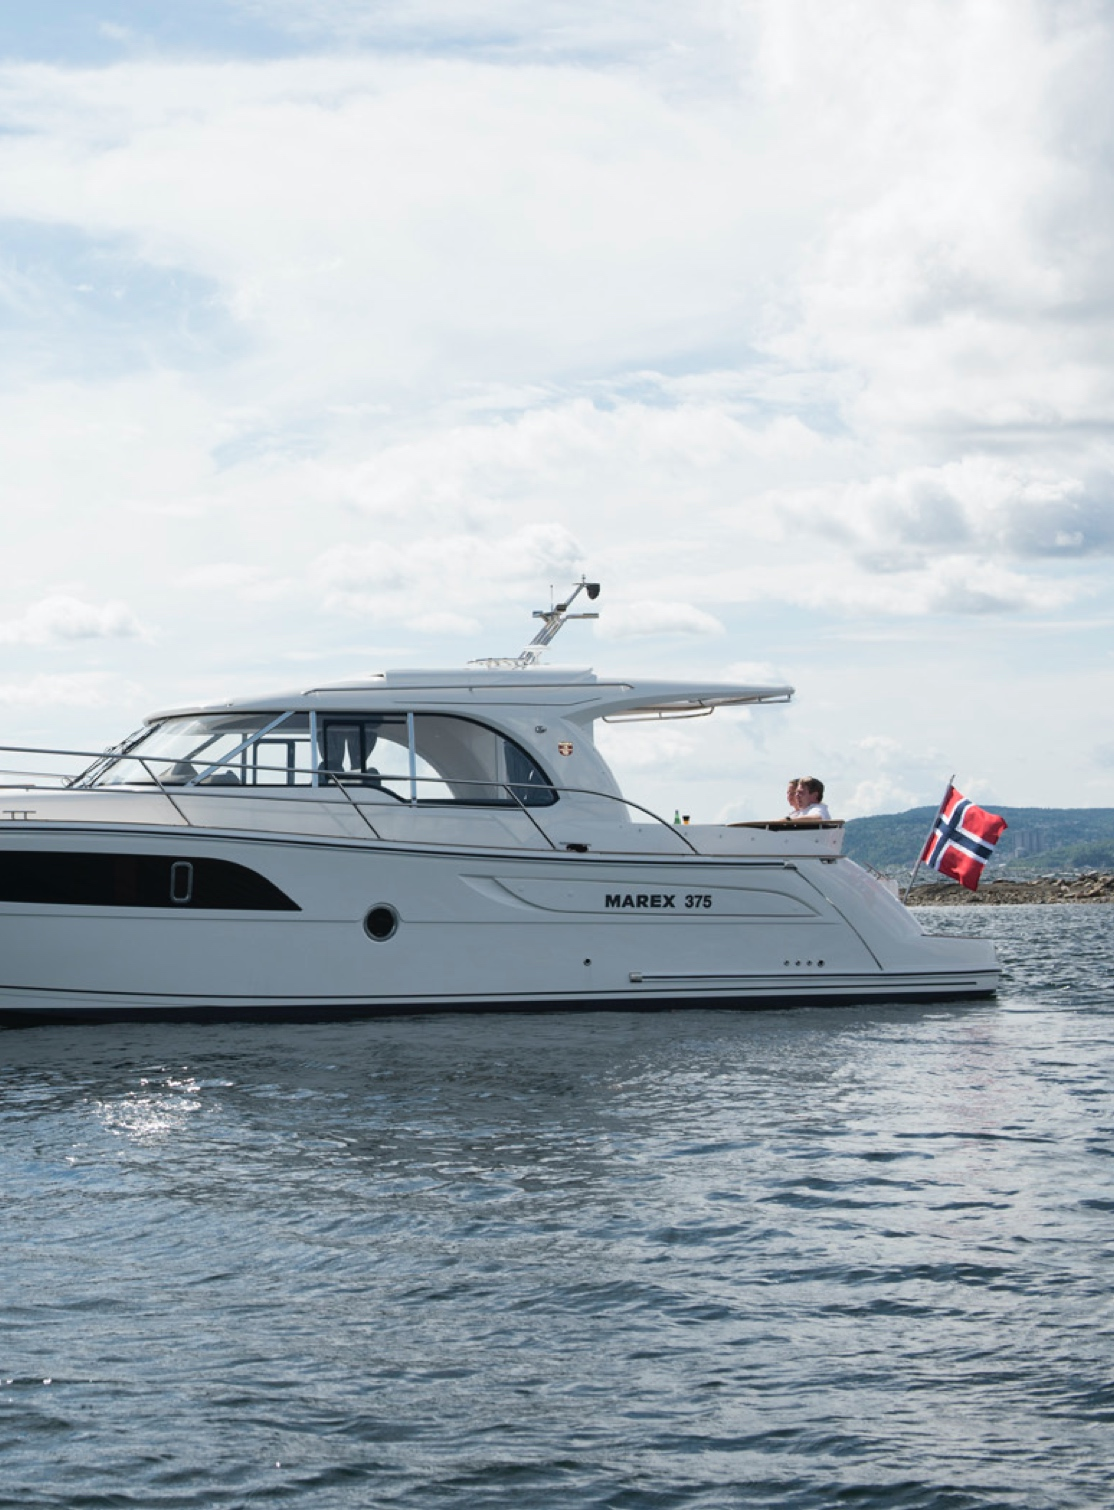 Marex boat in a norwegian fjord